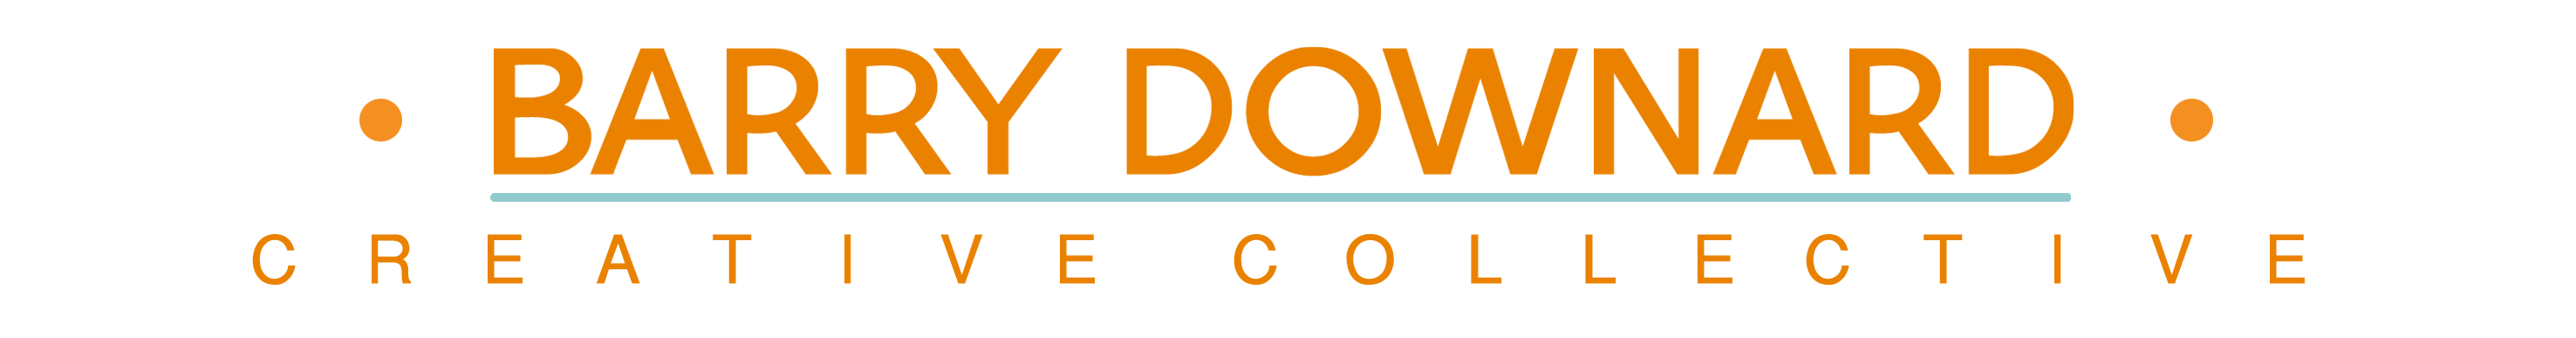 BARRY DOWNARD CREATIVE COLLECTIVE logo 2